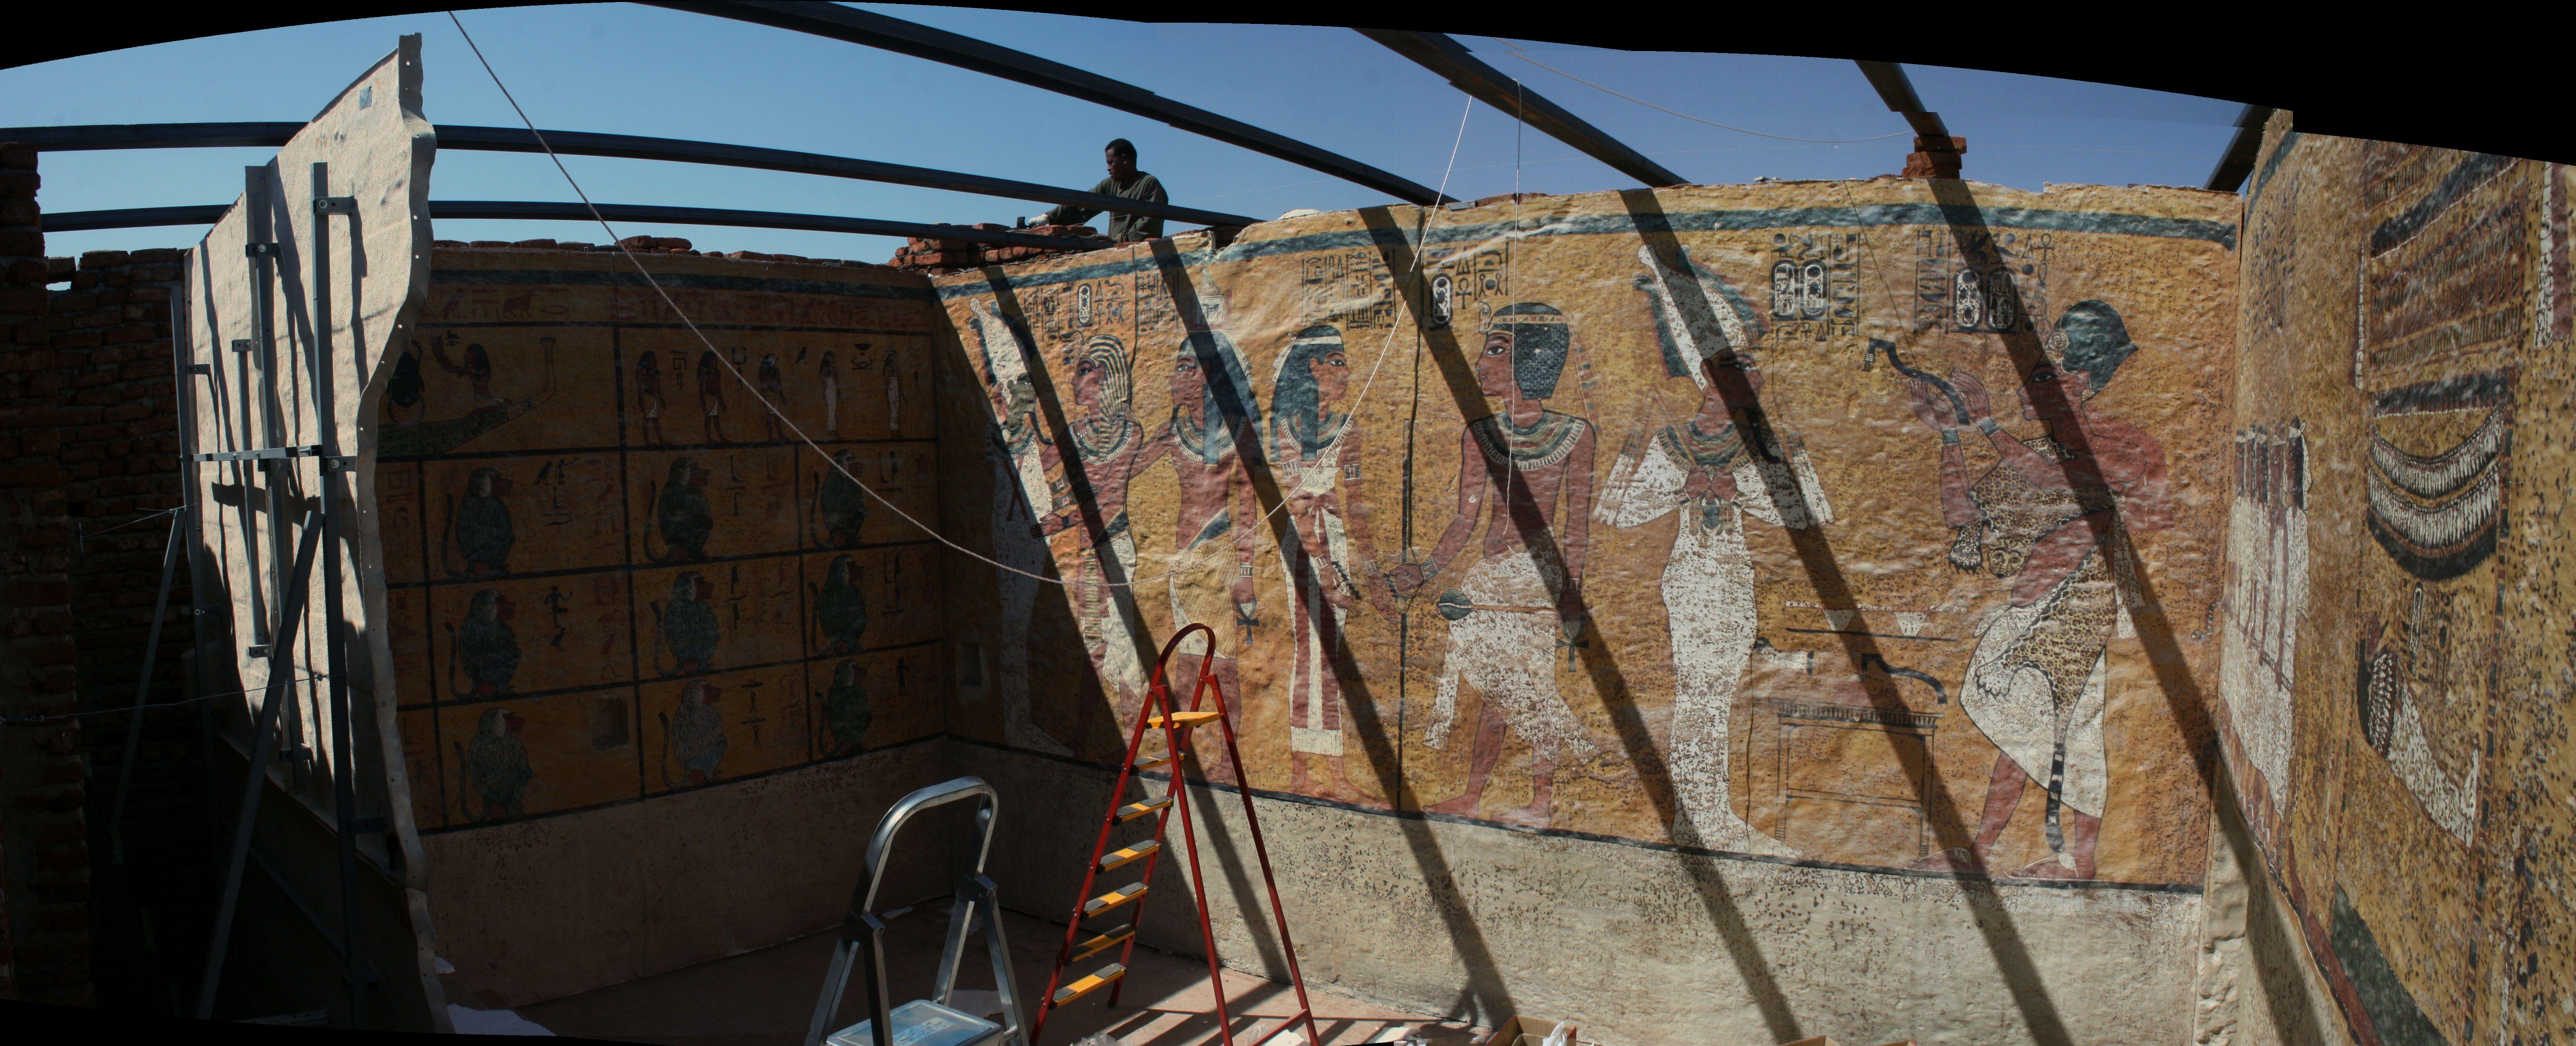 A Gorgeous Panorama Of The Tutankhamun Facsimile Copyright Tarek Waly Center Architecture Heritage مركز طارق والى العمارة والتراث Luxor Tutankhamun Egypt